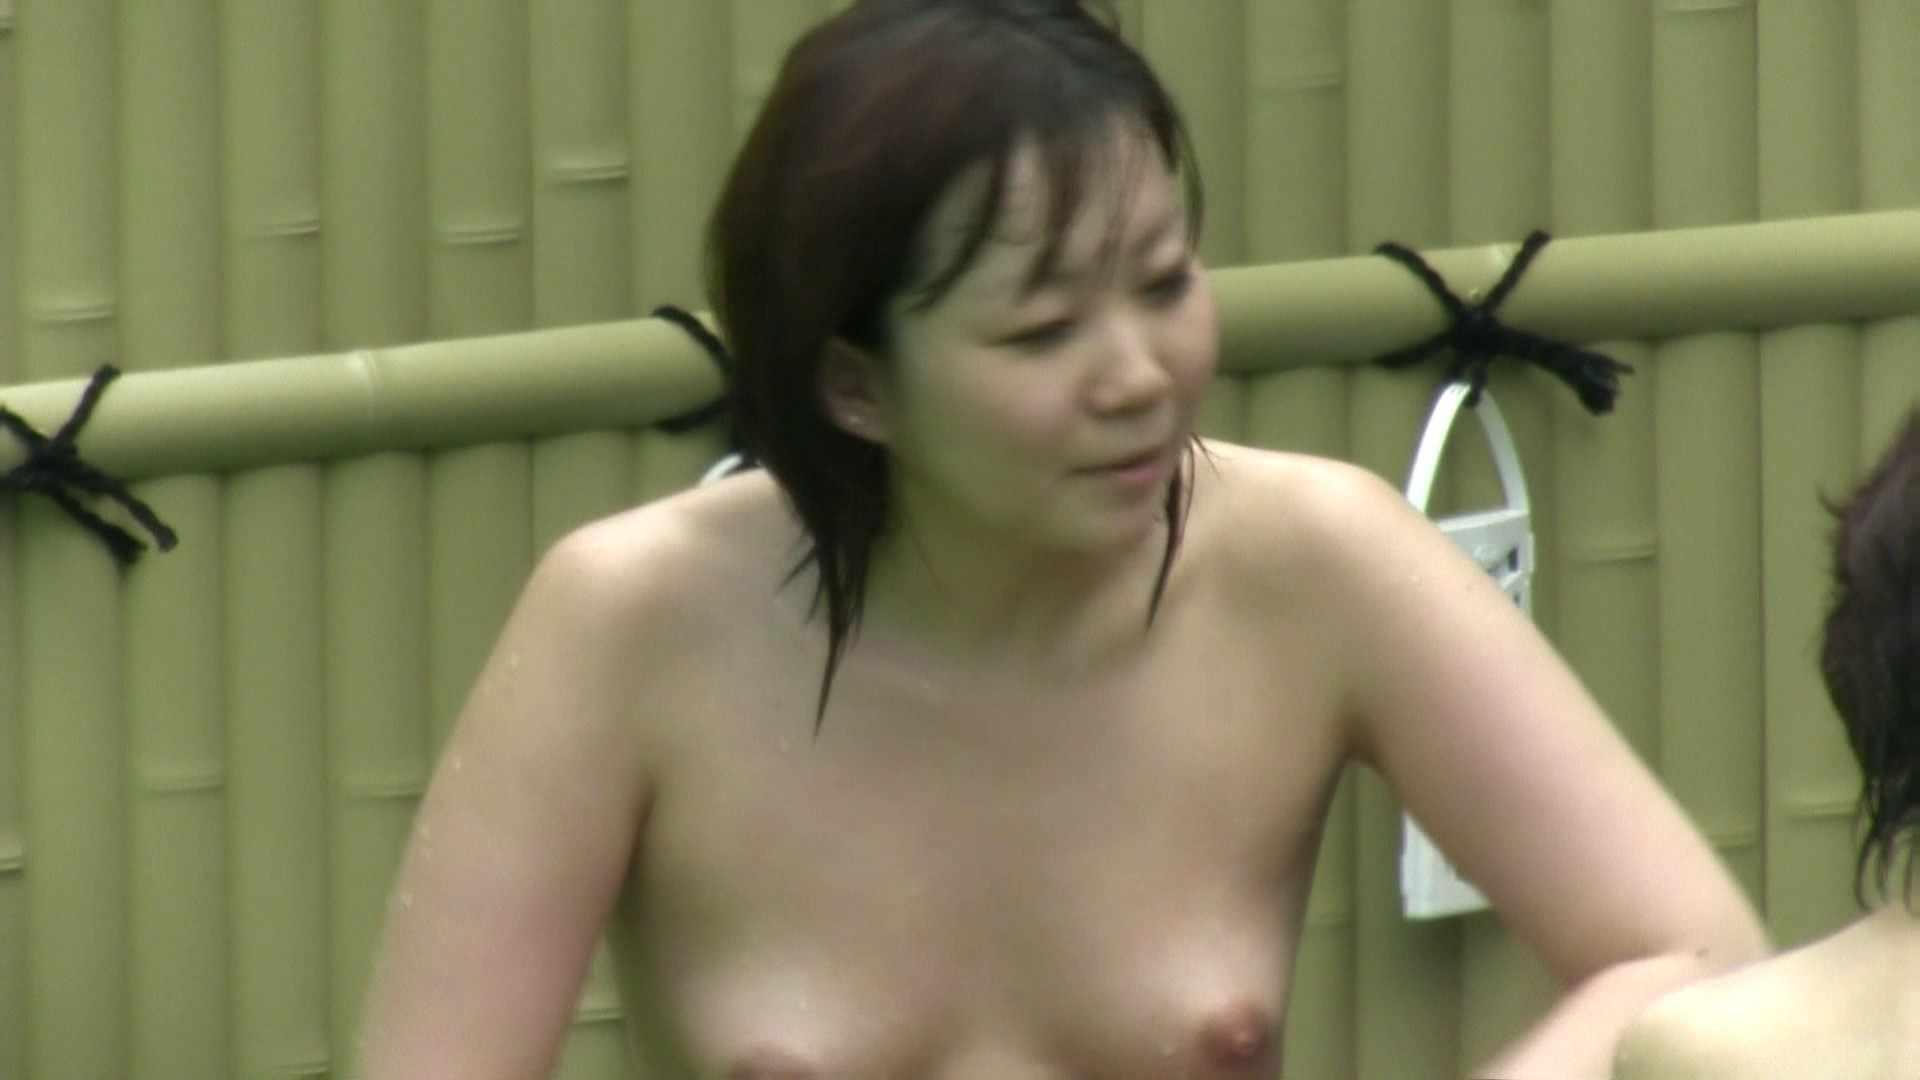 Aquaな露天風呂Vol.664 盗撮  70連発 63